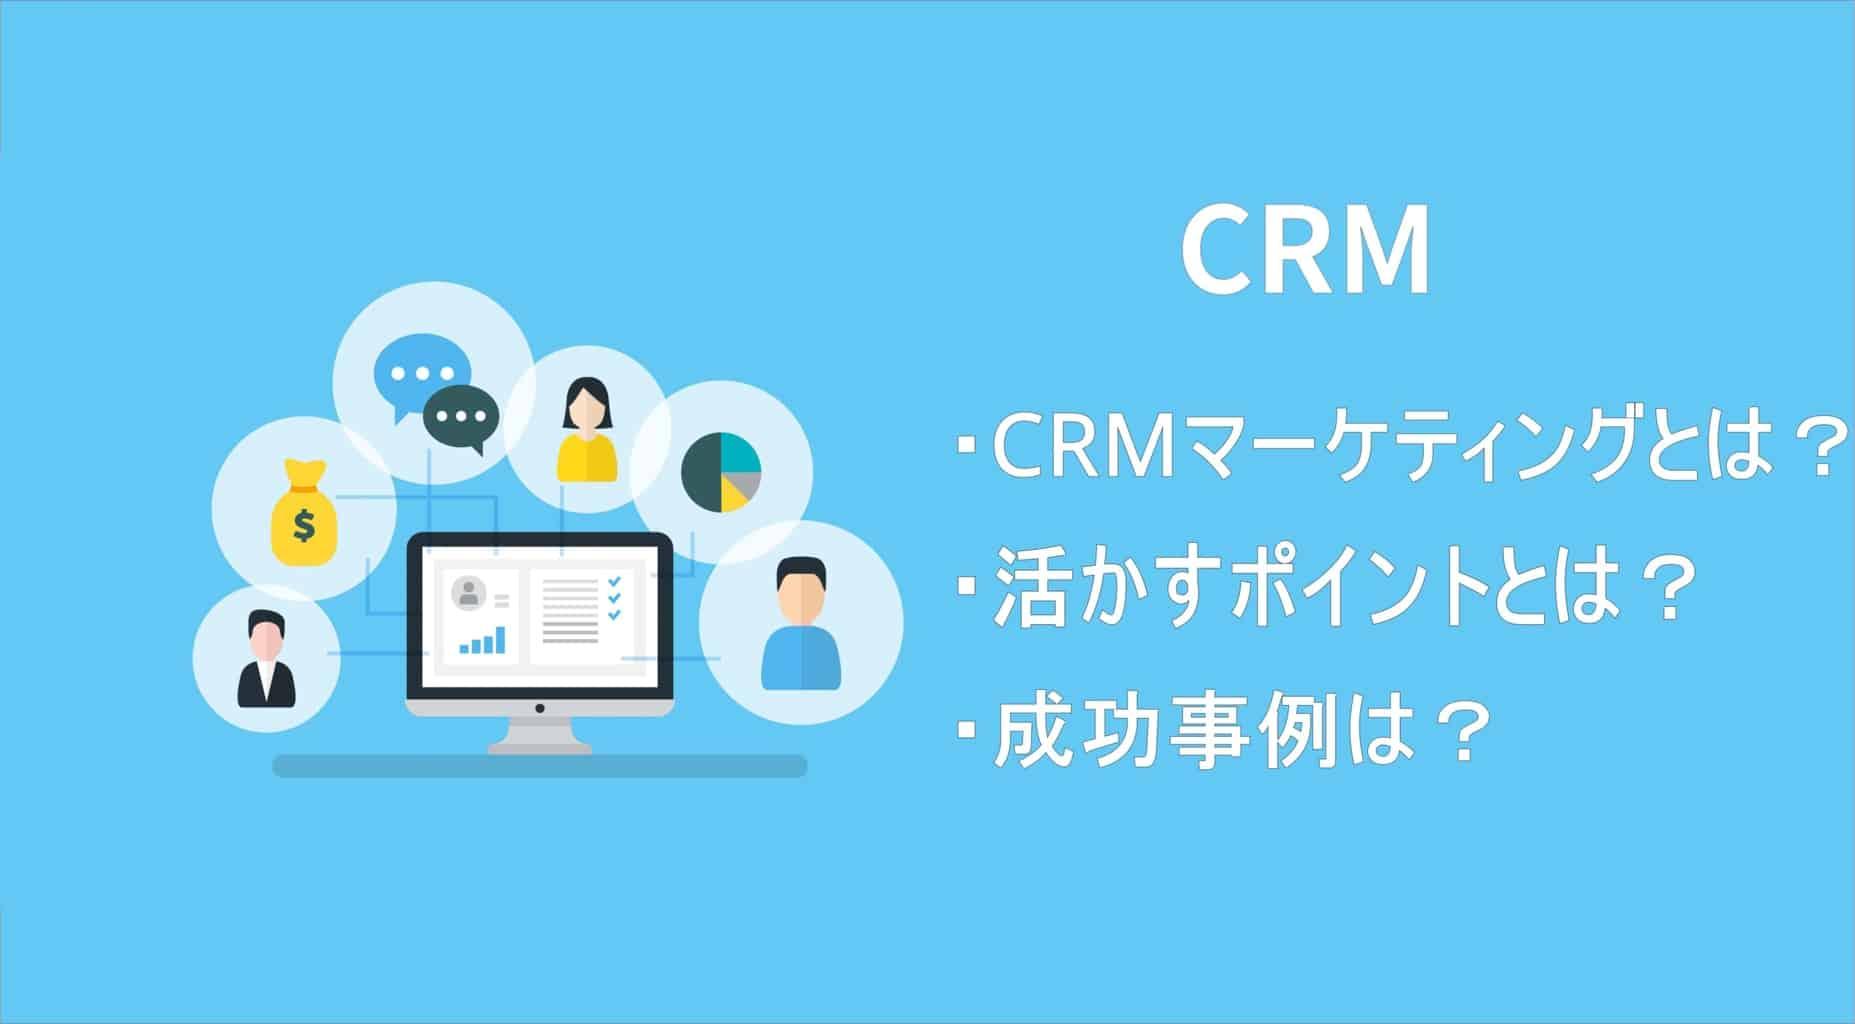 CRMマーケティングの成功事例5選!活用ポイントや事前準備も紹介!